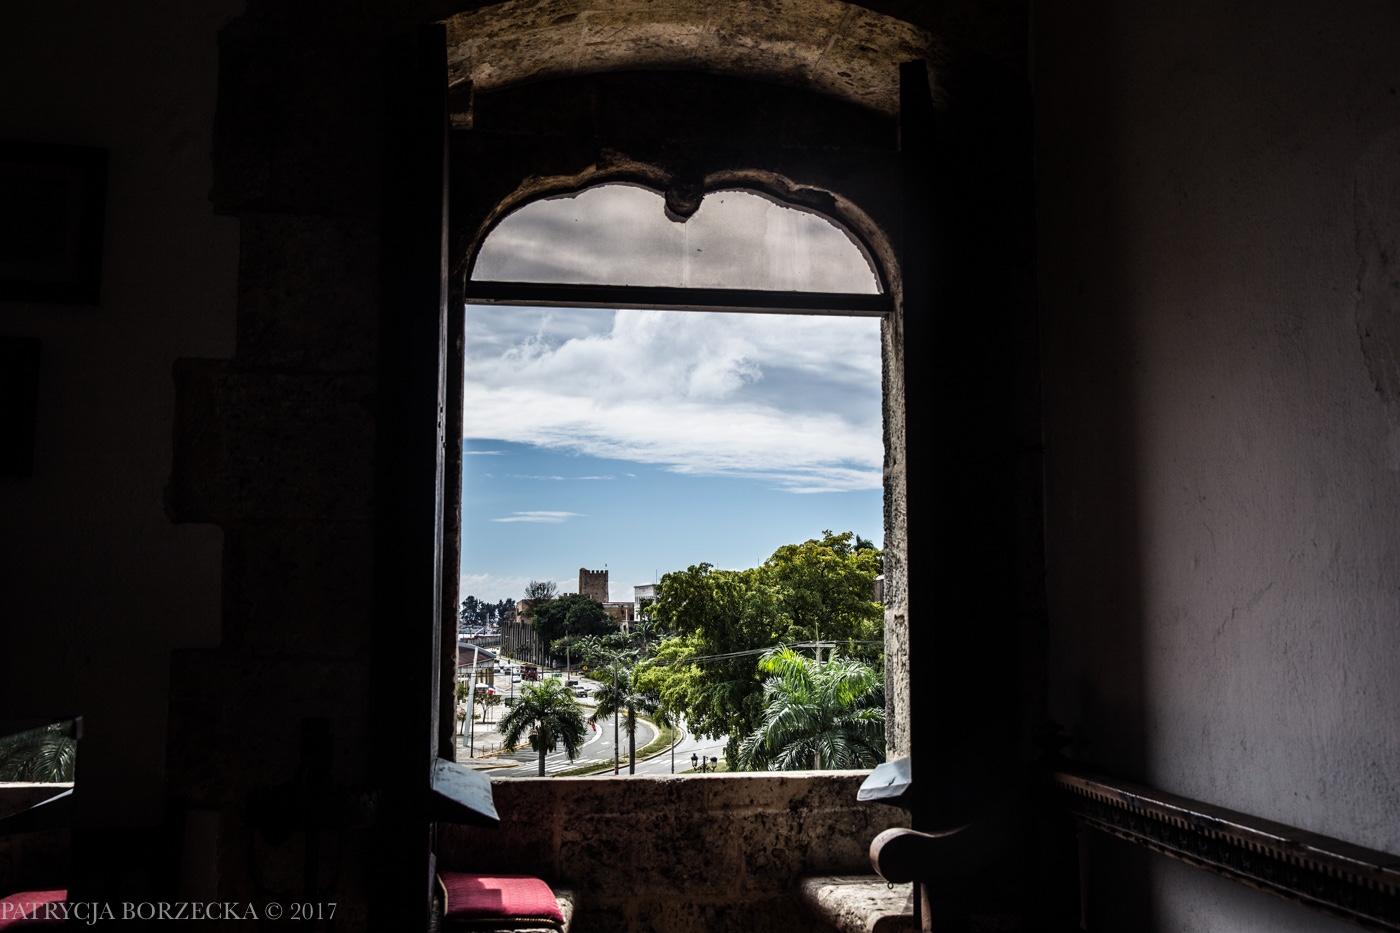 Patrycja-Borzecka-Photo-Santo-Domingo-Zona-Colonial-07